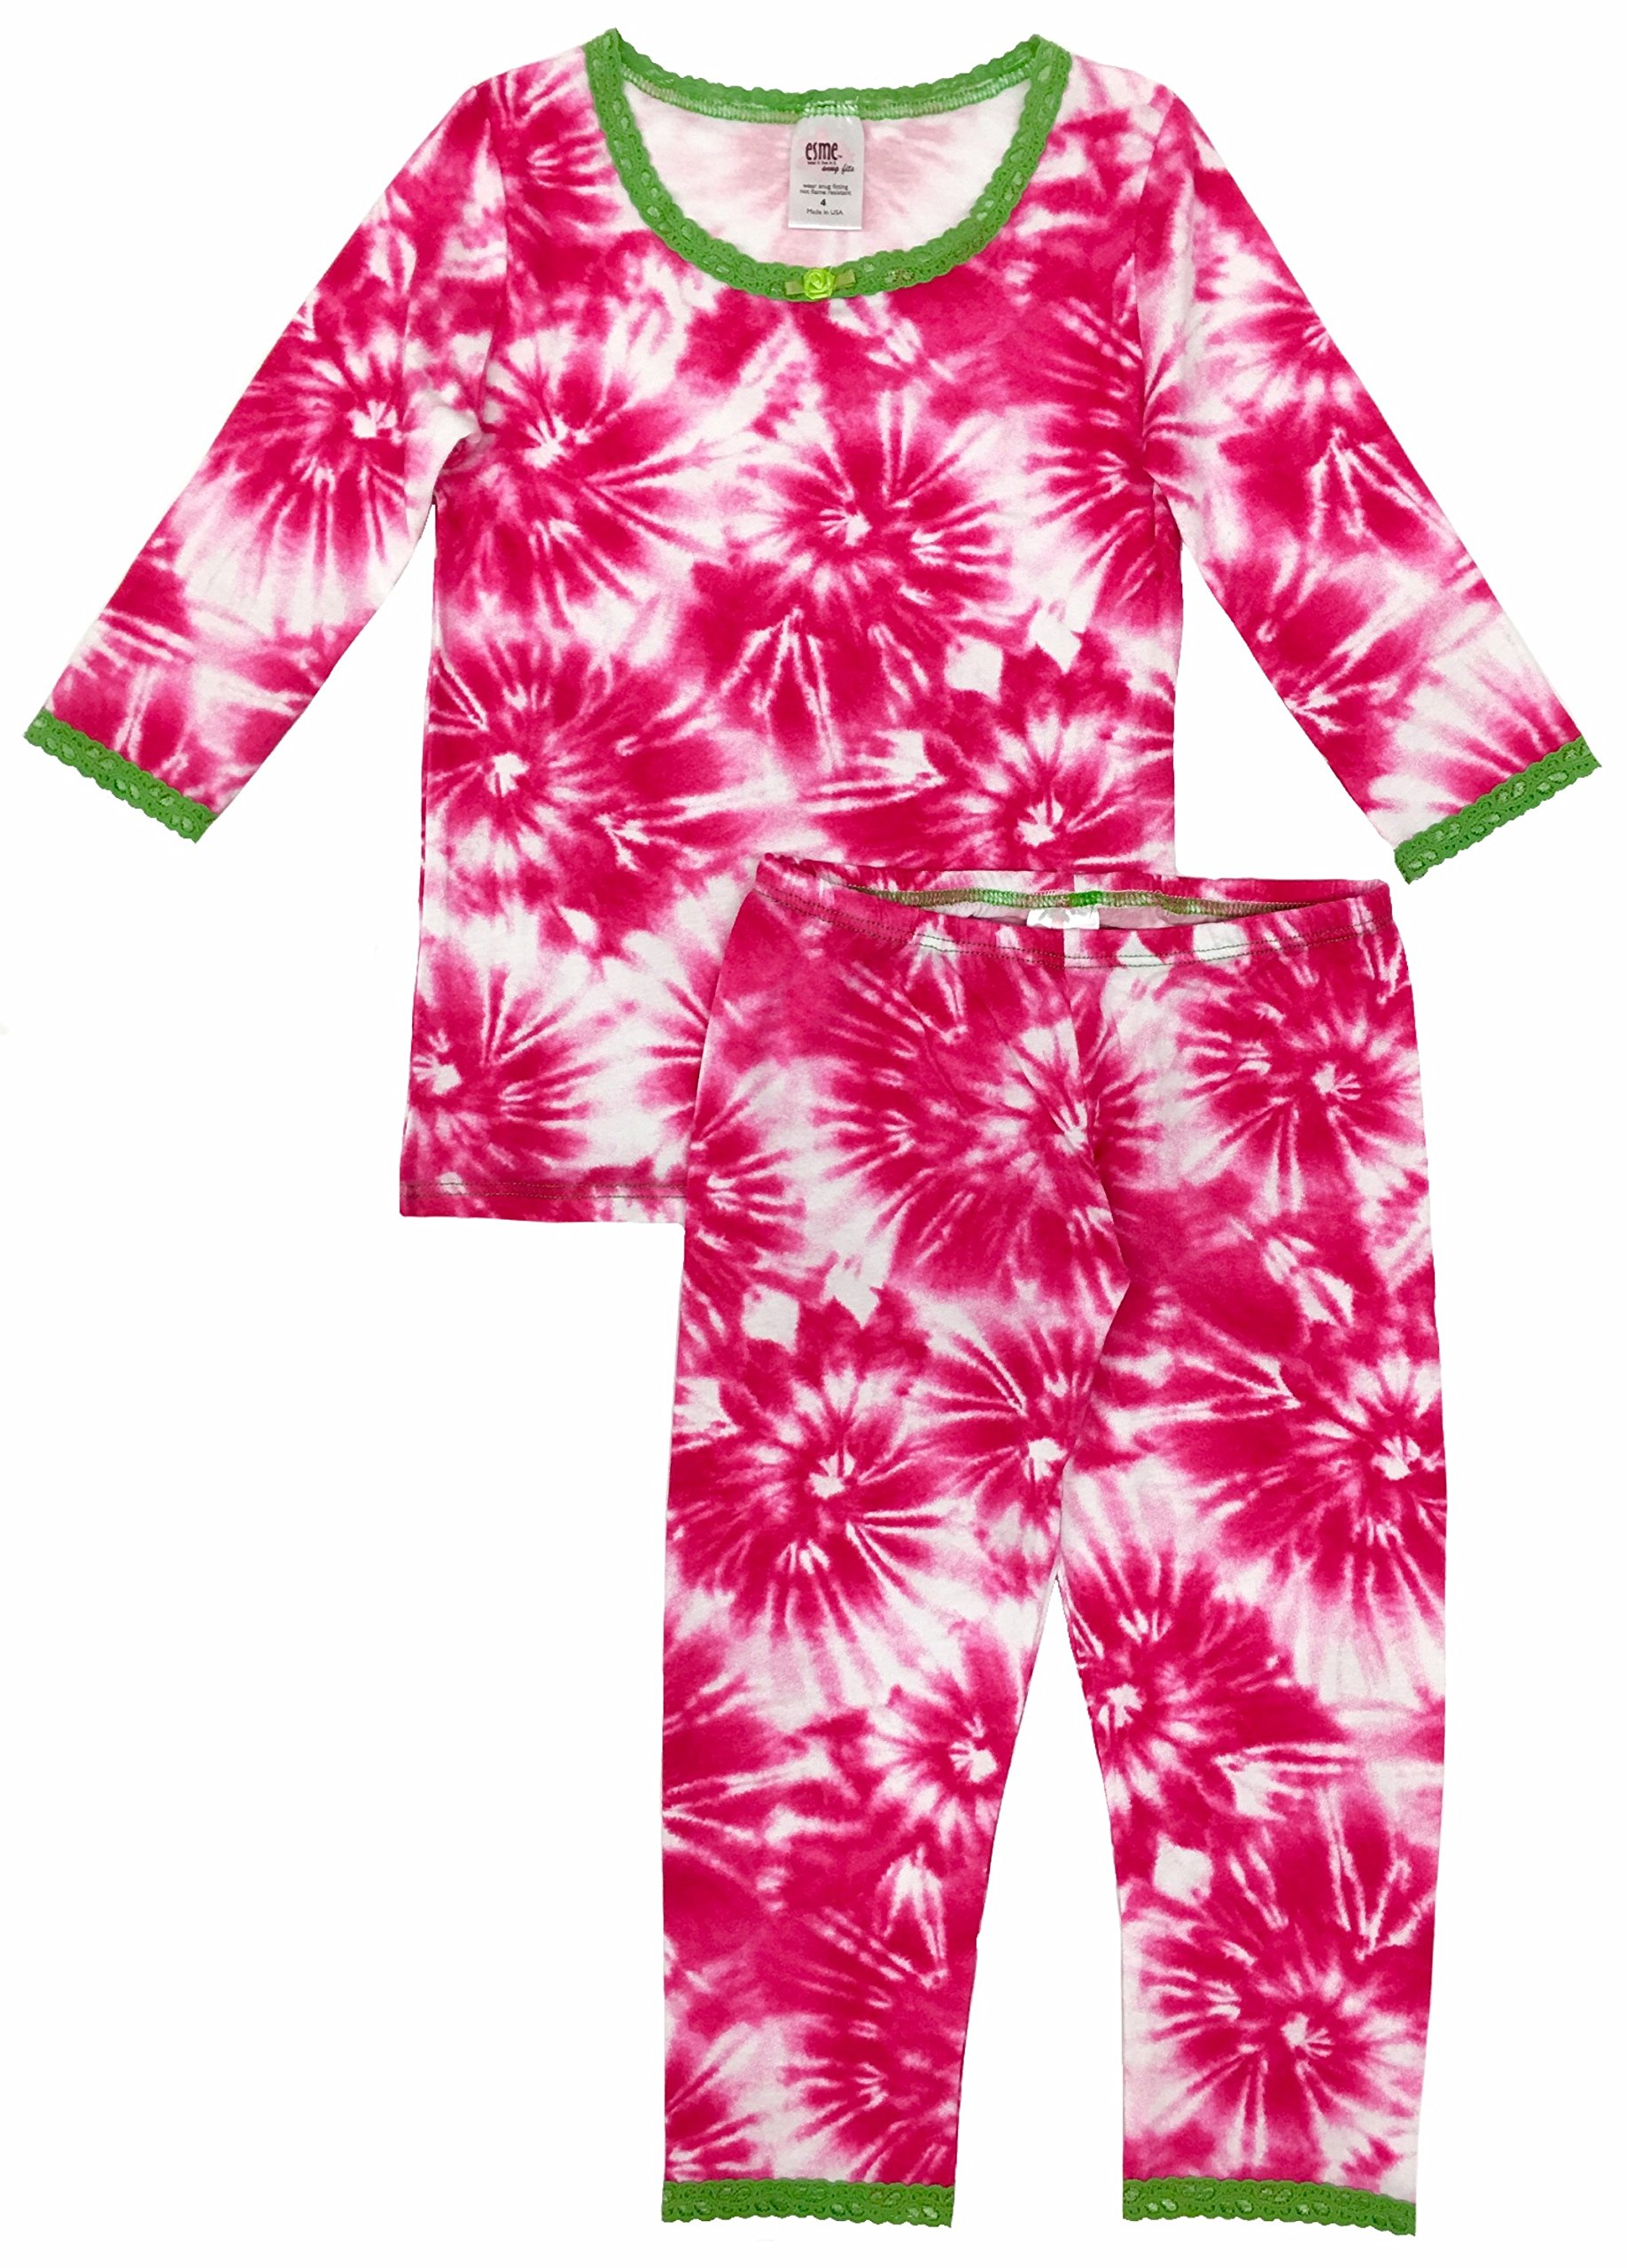 Esme Girl's Sleepwear 3/4 Long Sleeve Top Leggings Set-8 Fuchsia Burst